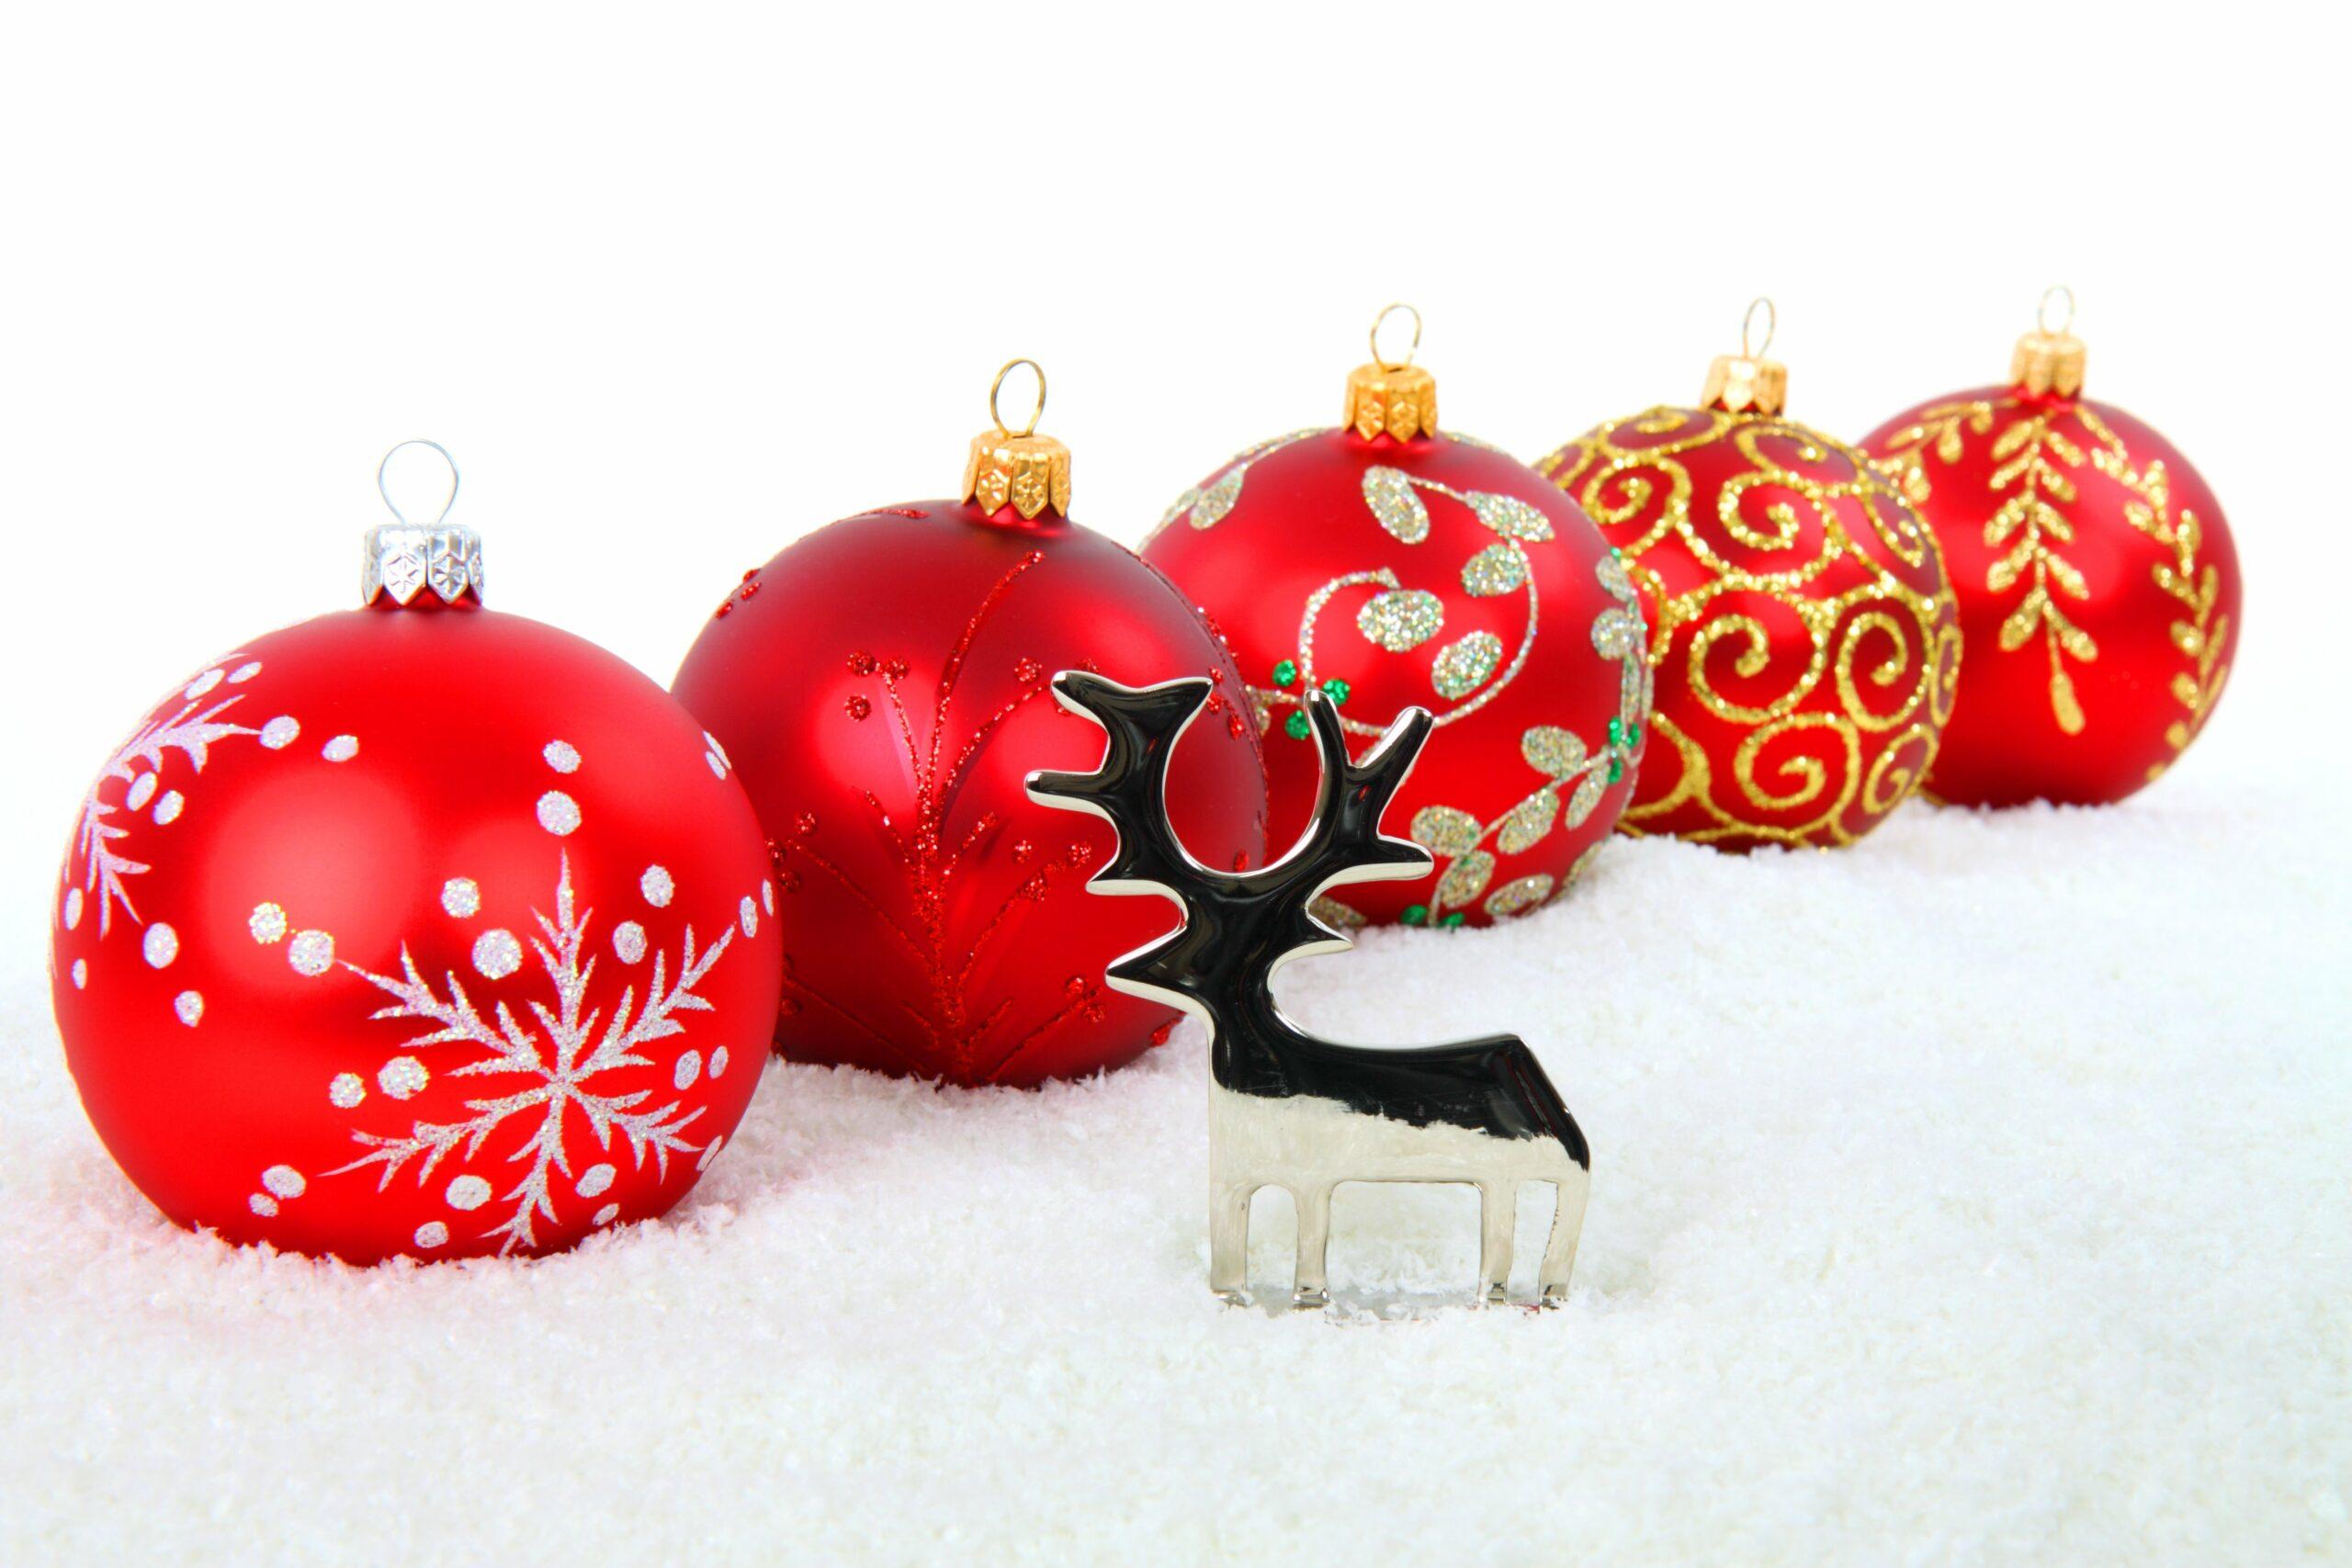 Happy Christmas + where I've been hiding